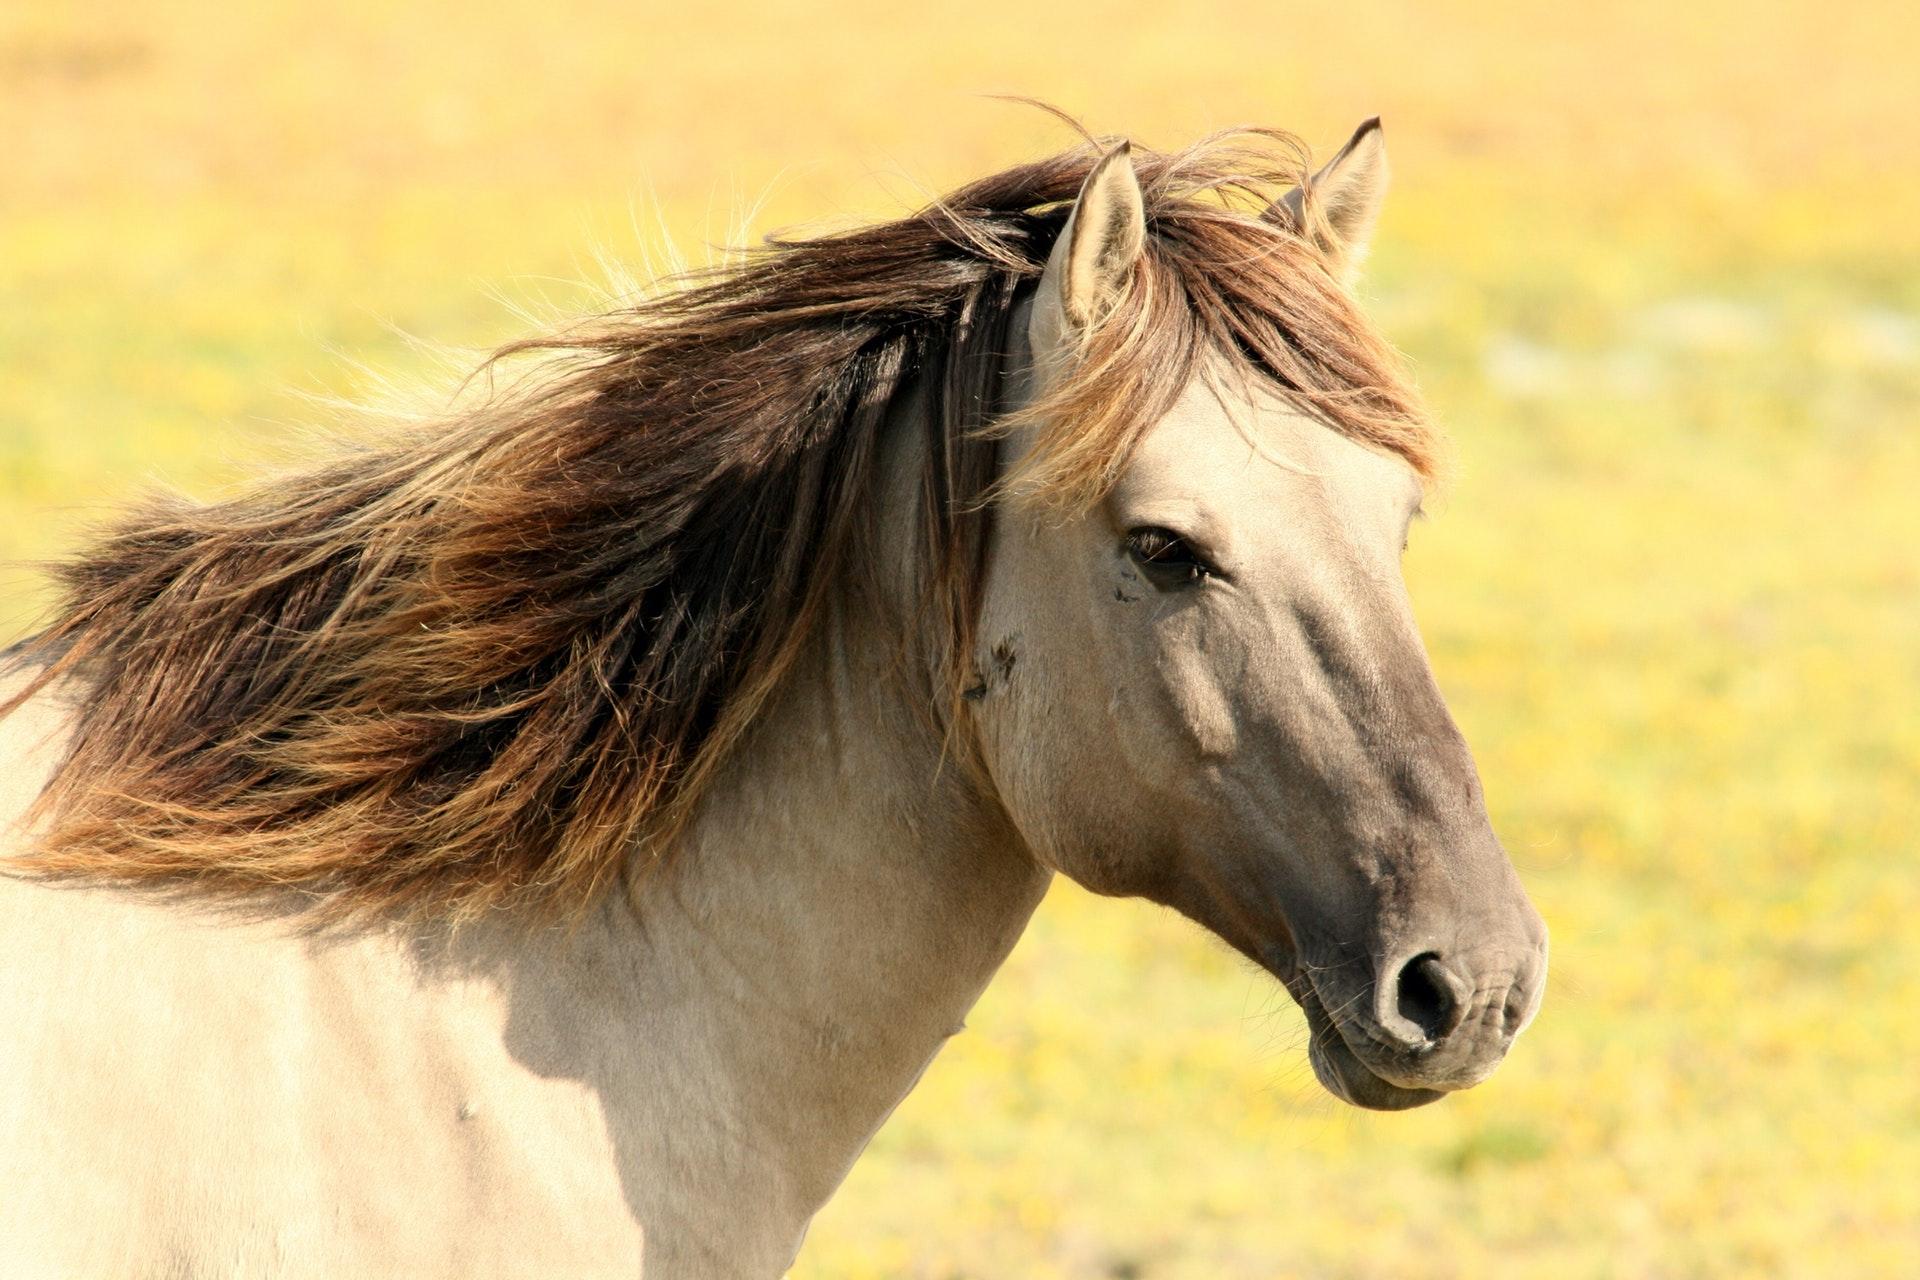 a white horse with a long dark mane